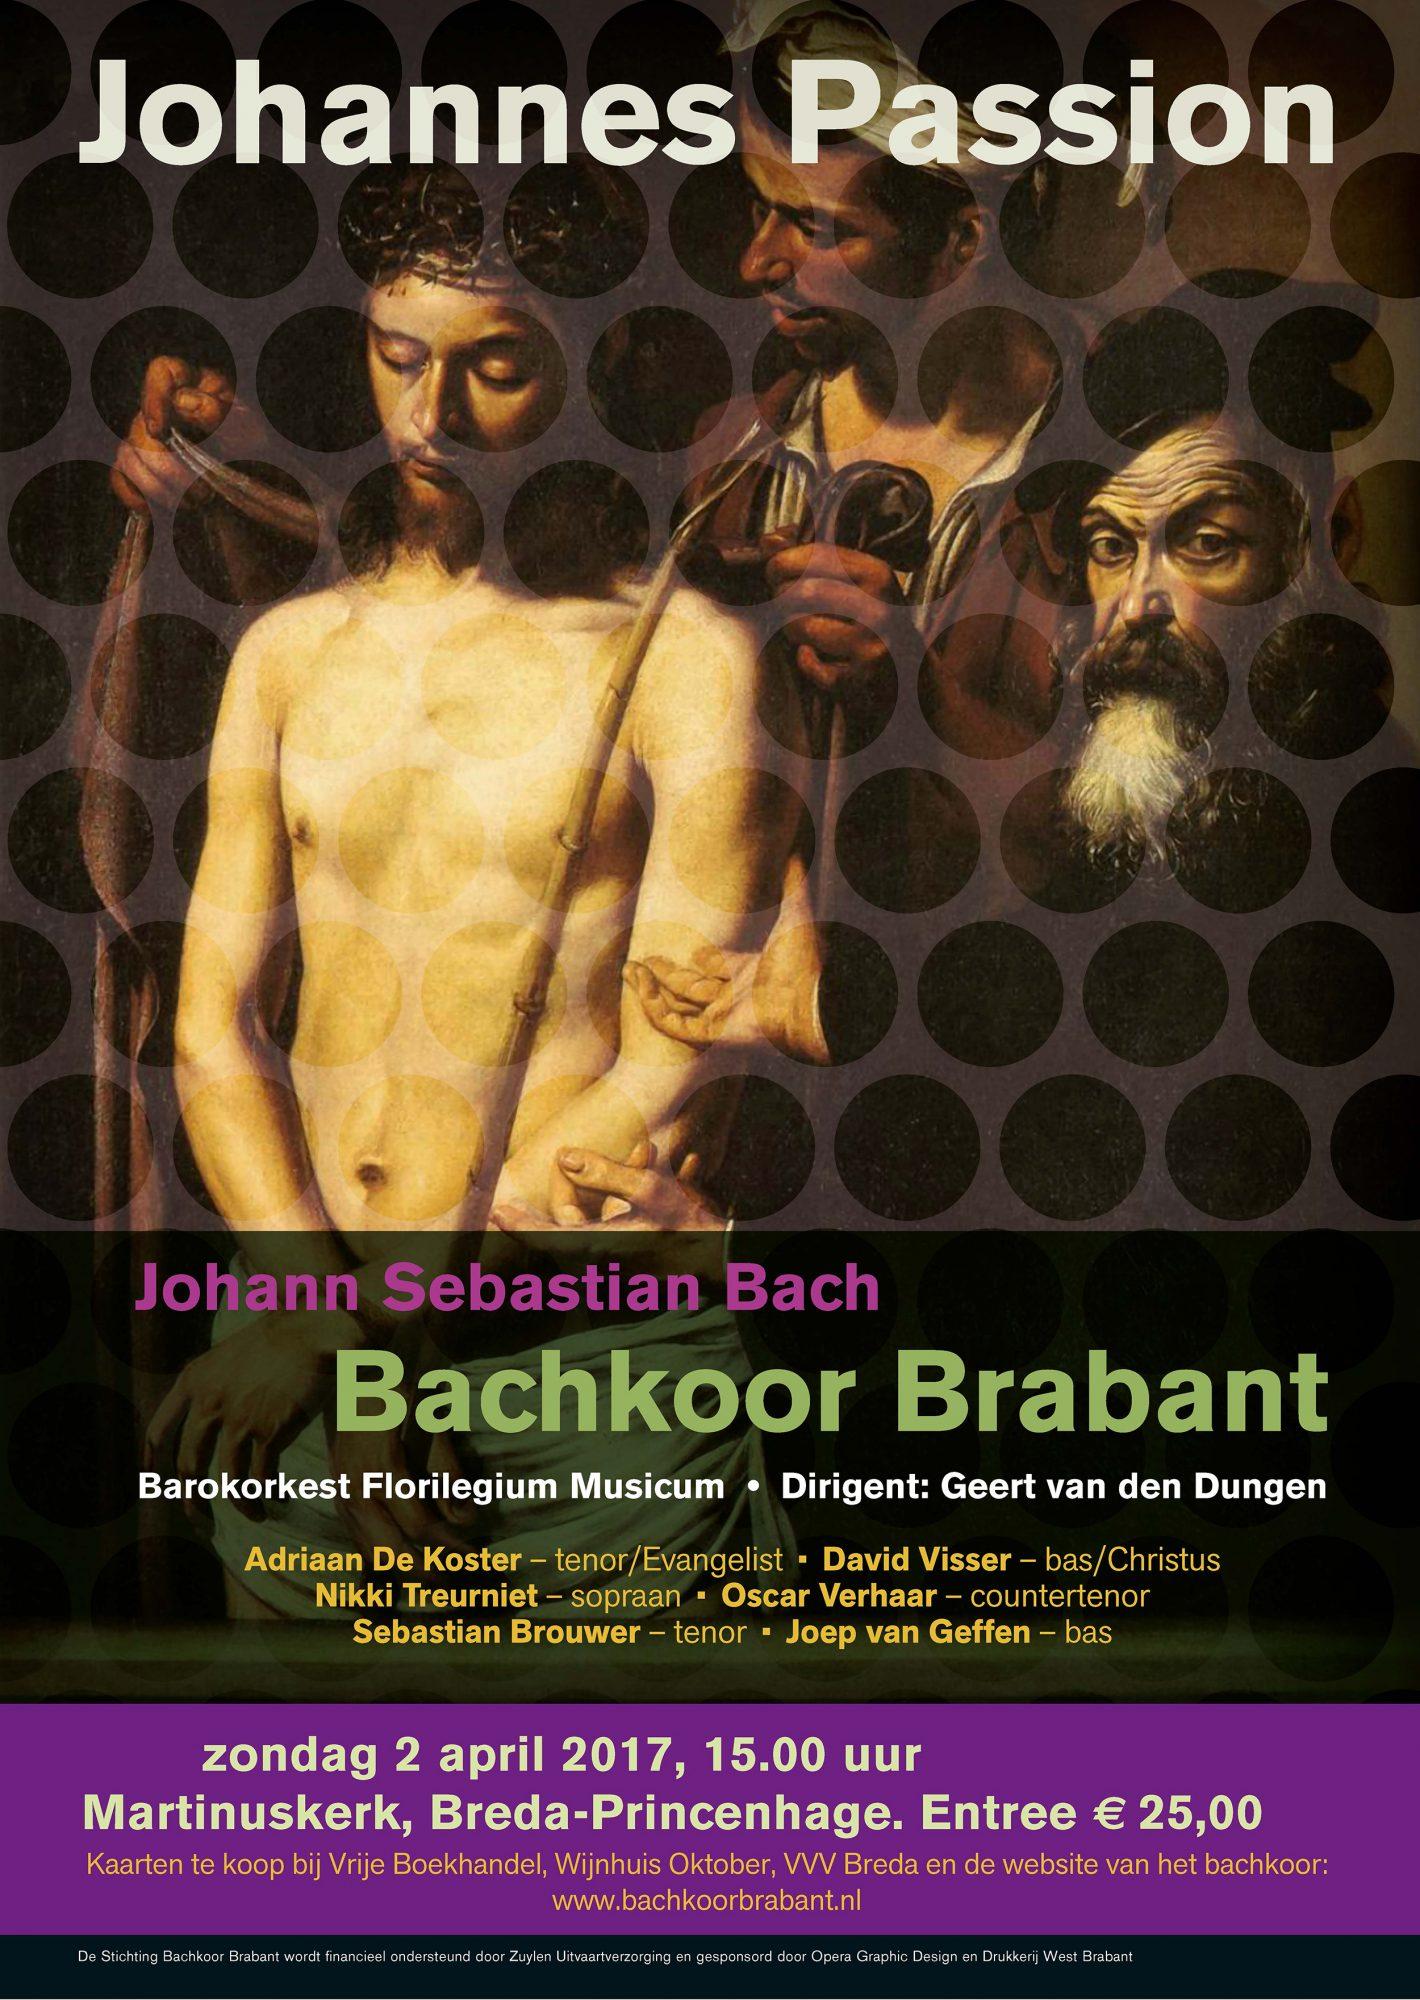 Bachkoor Brabant -  Johannes Passion 2017